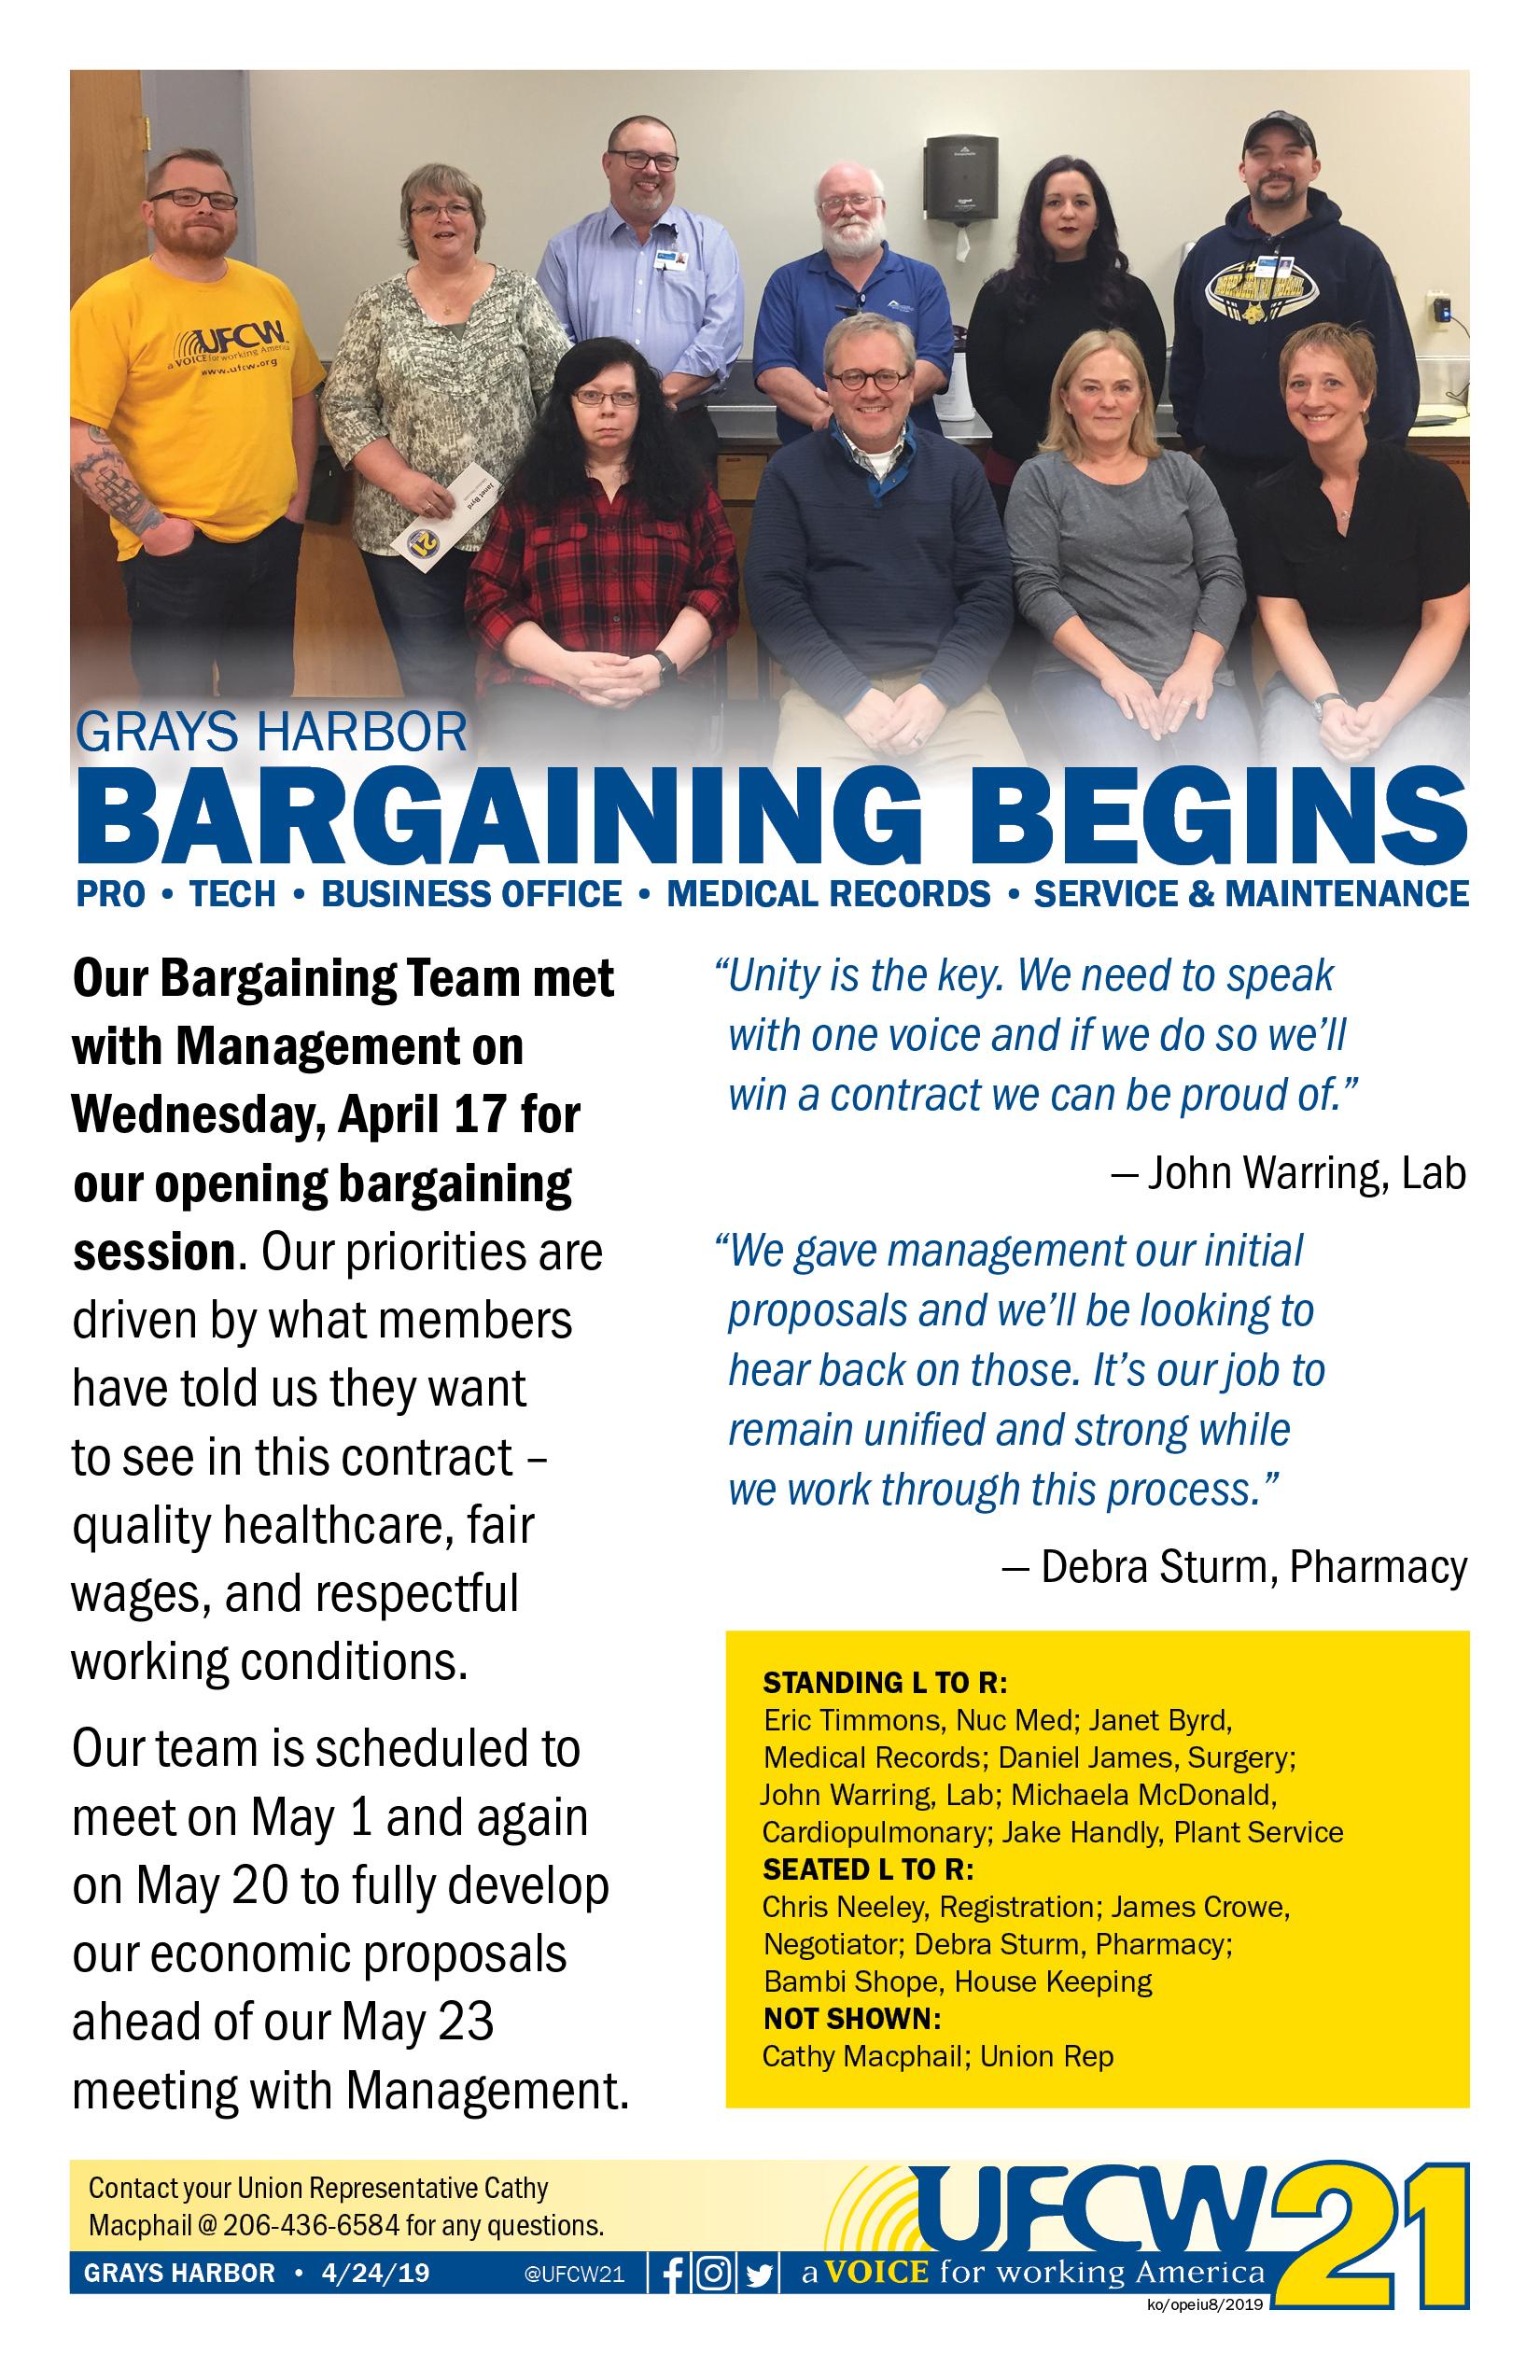 Grays Harbor - Bargaining Begins — UFCW 21